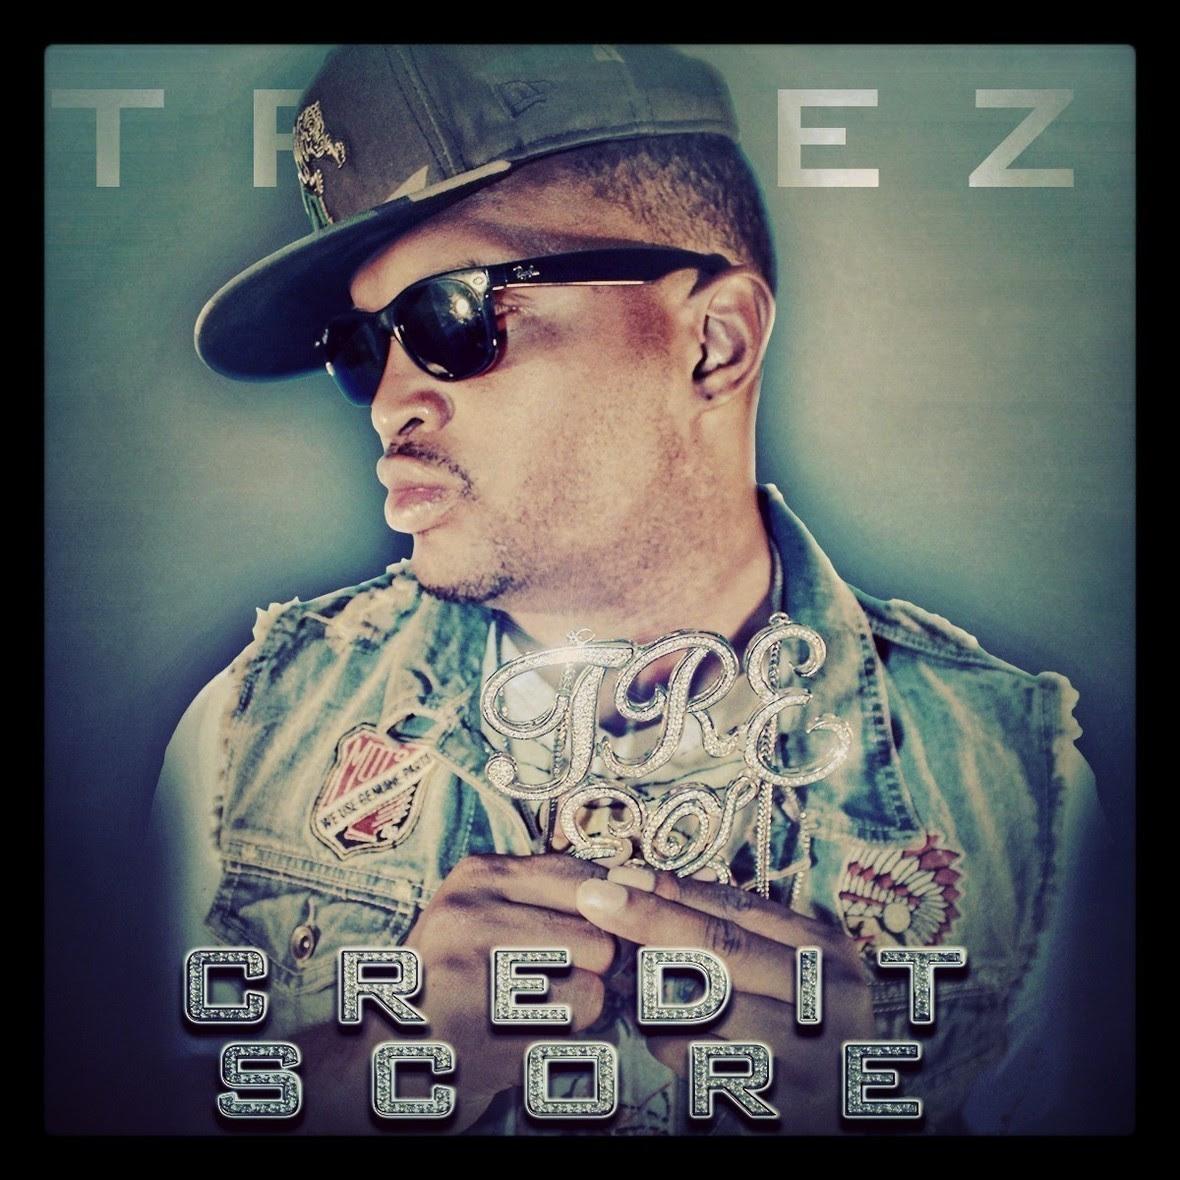 Tre-Ez - Credit Score artwork